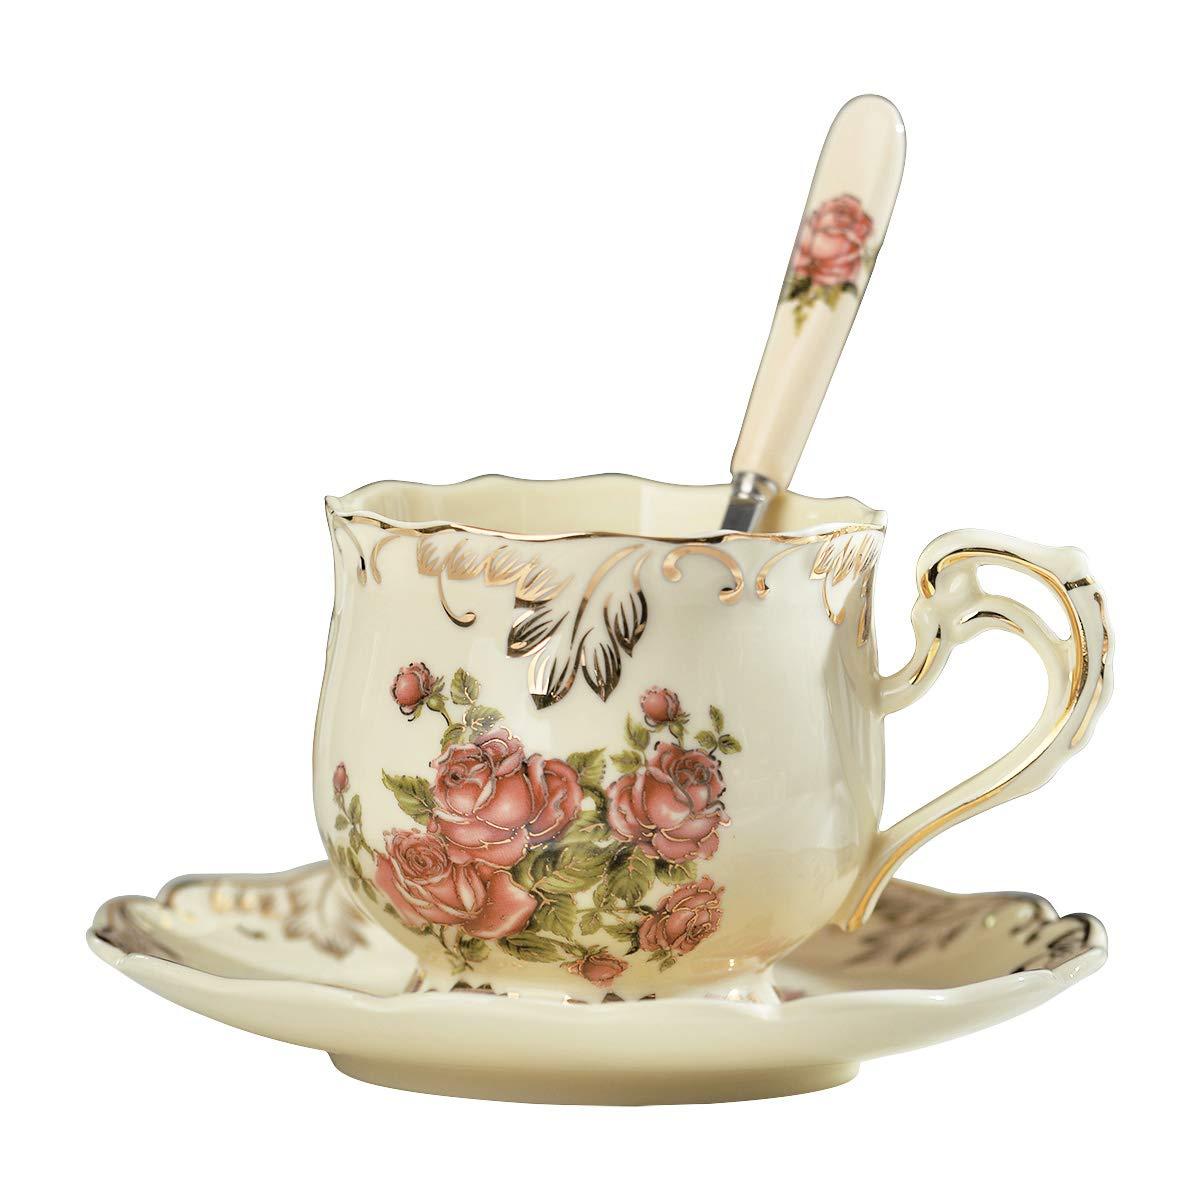 YOLIFE Flowering Shrubs Ivory Ceramic Tea cup with Saucer Set,Floral Tea Cup,8oz A024-10